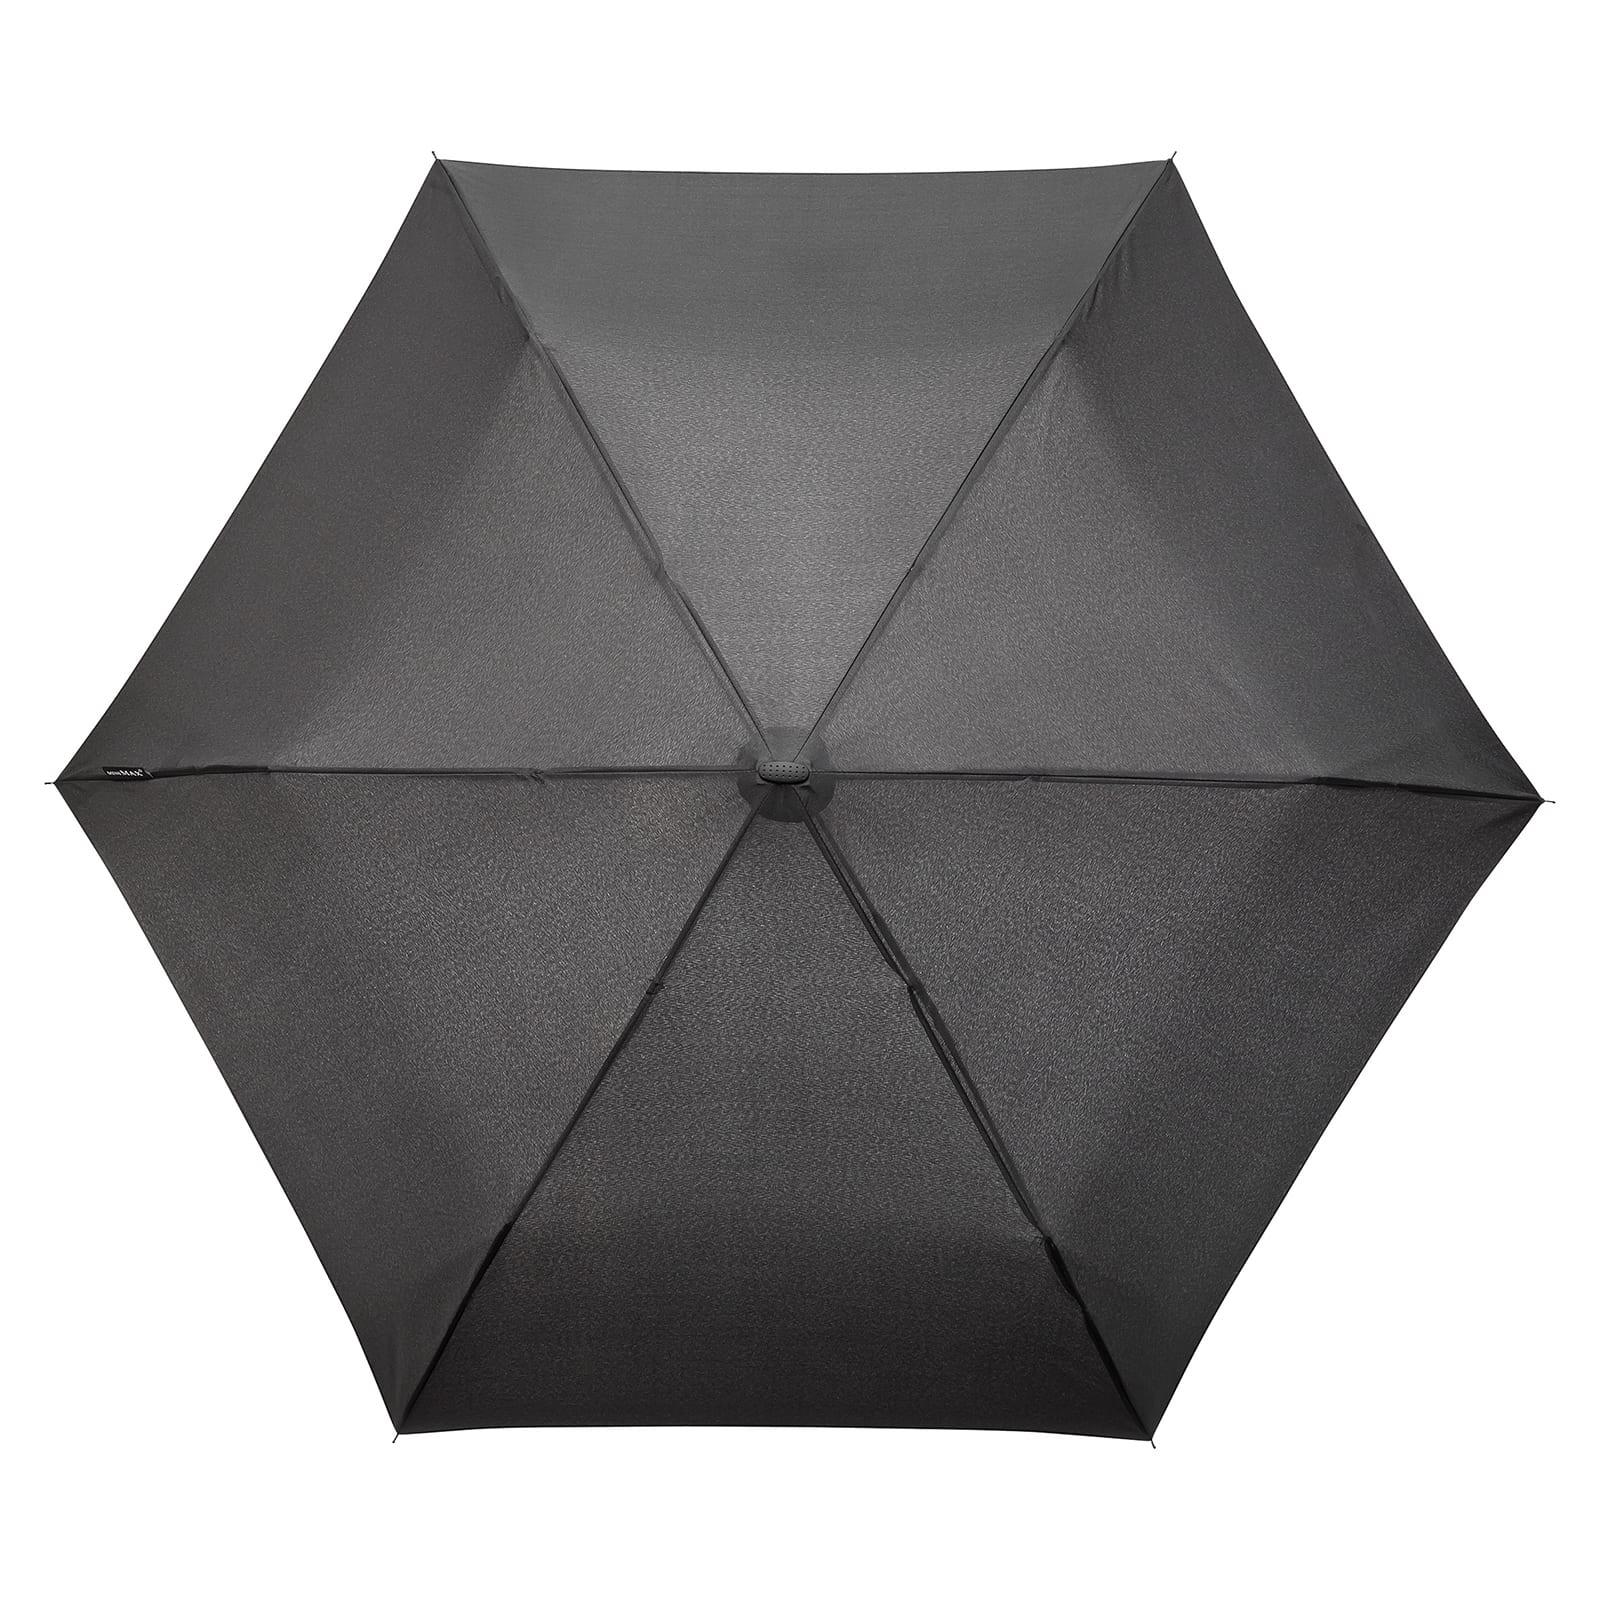 5d11faa6e Impliva MiniMAX® Flat Folding Umbrella Black | Design Is This